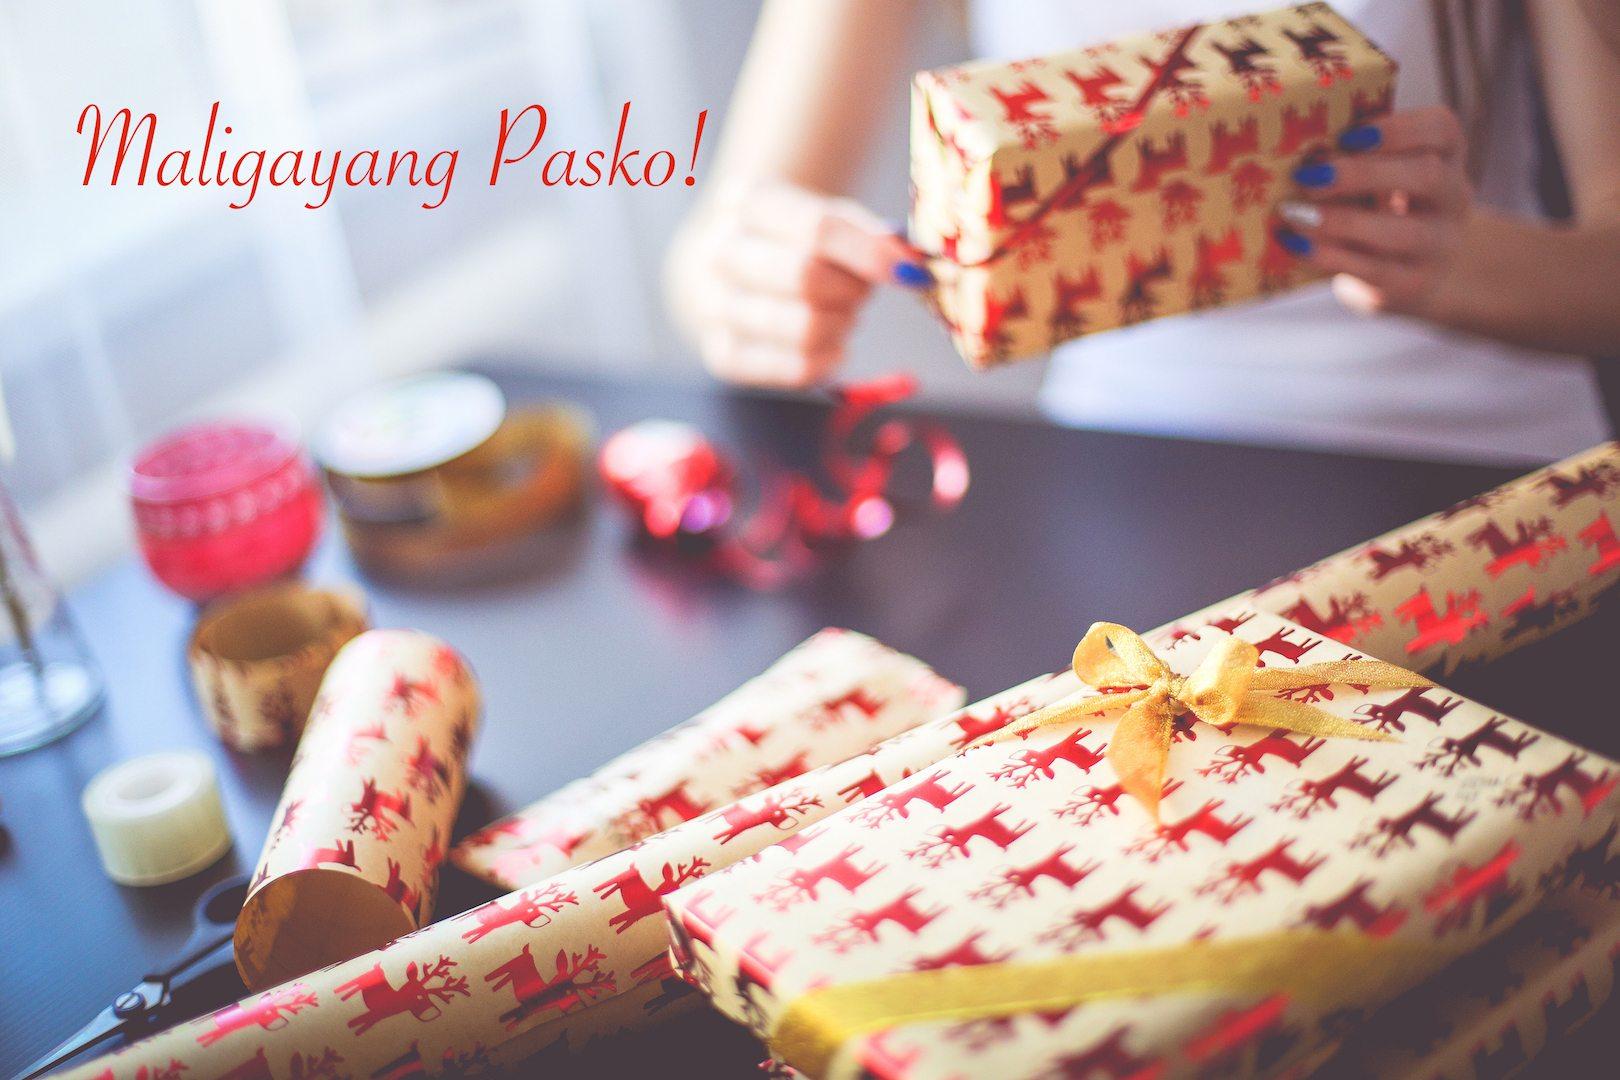 Pinoy Christmas Wish List: Gadgets Edition